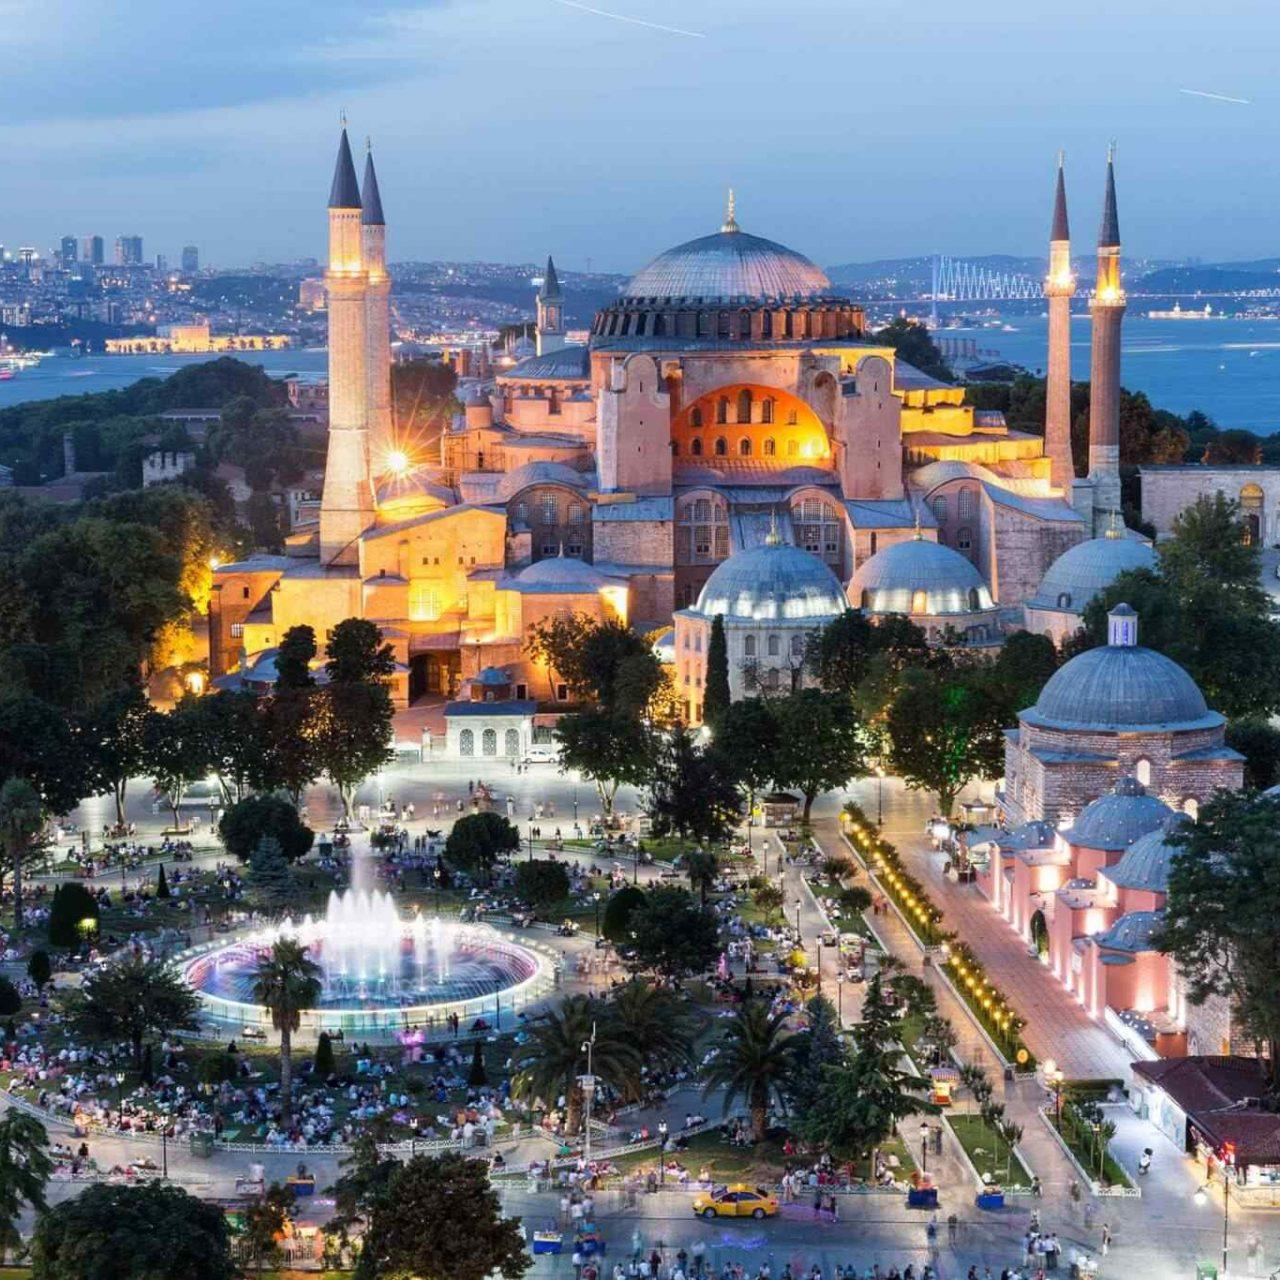 https://www.trekcentralnepal.com/wp-content/uploads/2018/09/destination-istanbul-02-1280x1280.jpg